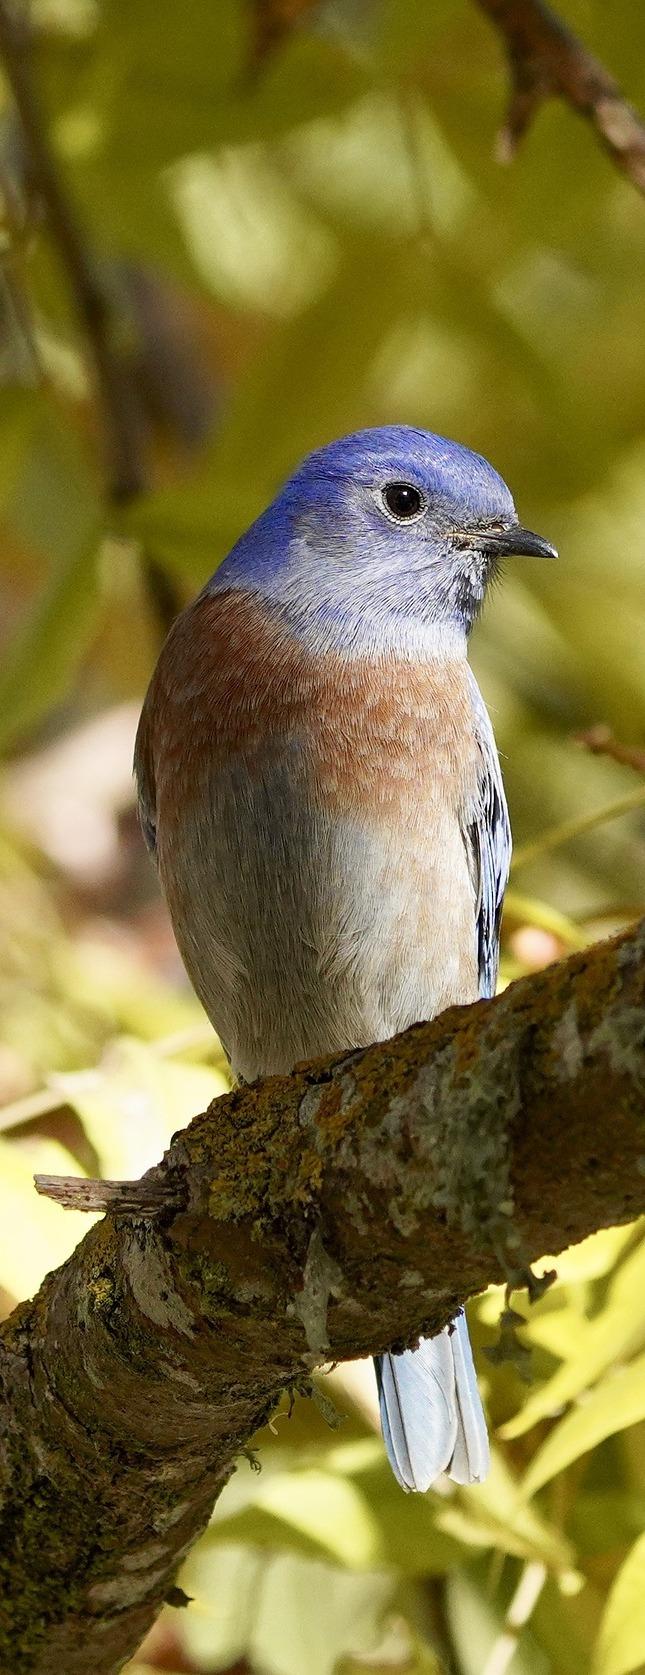 Lovely bluebird.